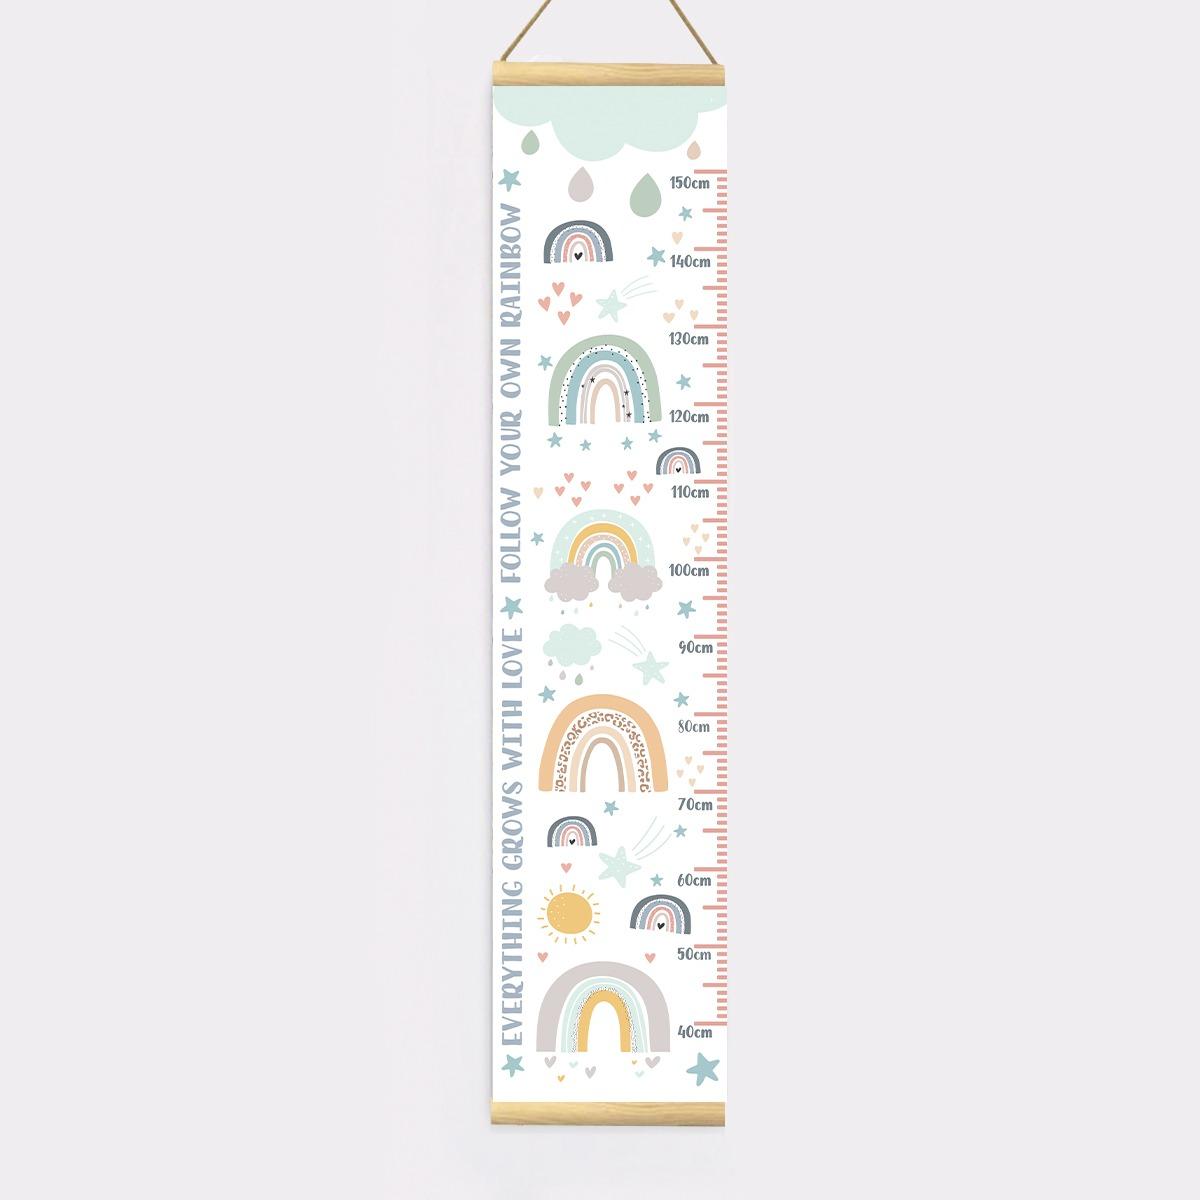 Rainbow Height Chart – Proof 1